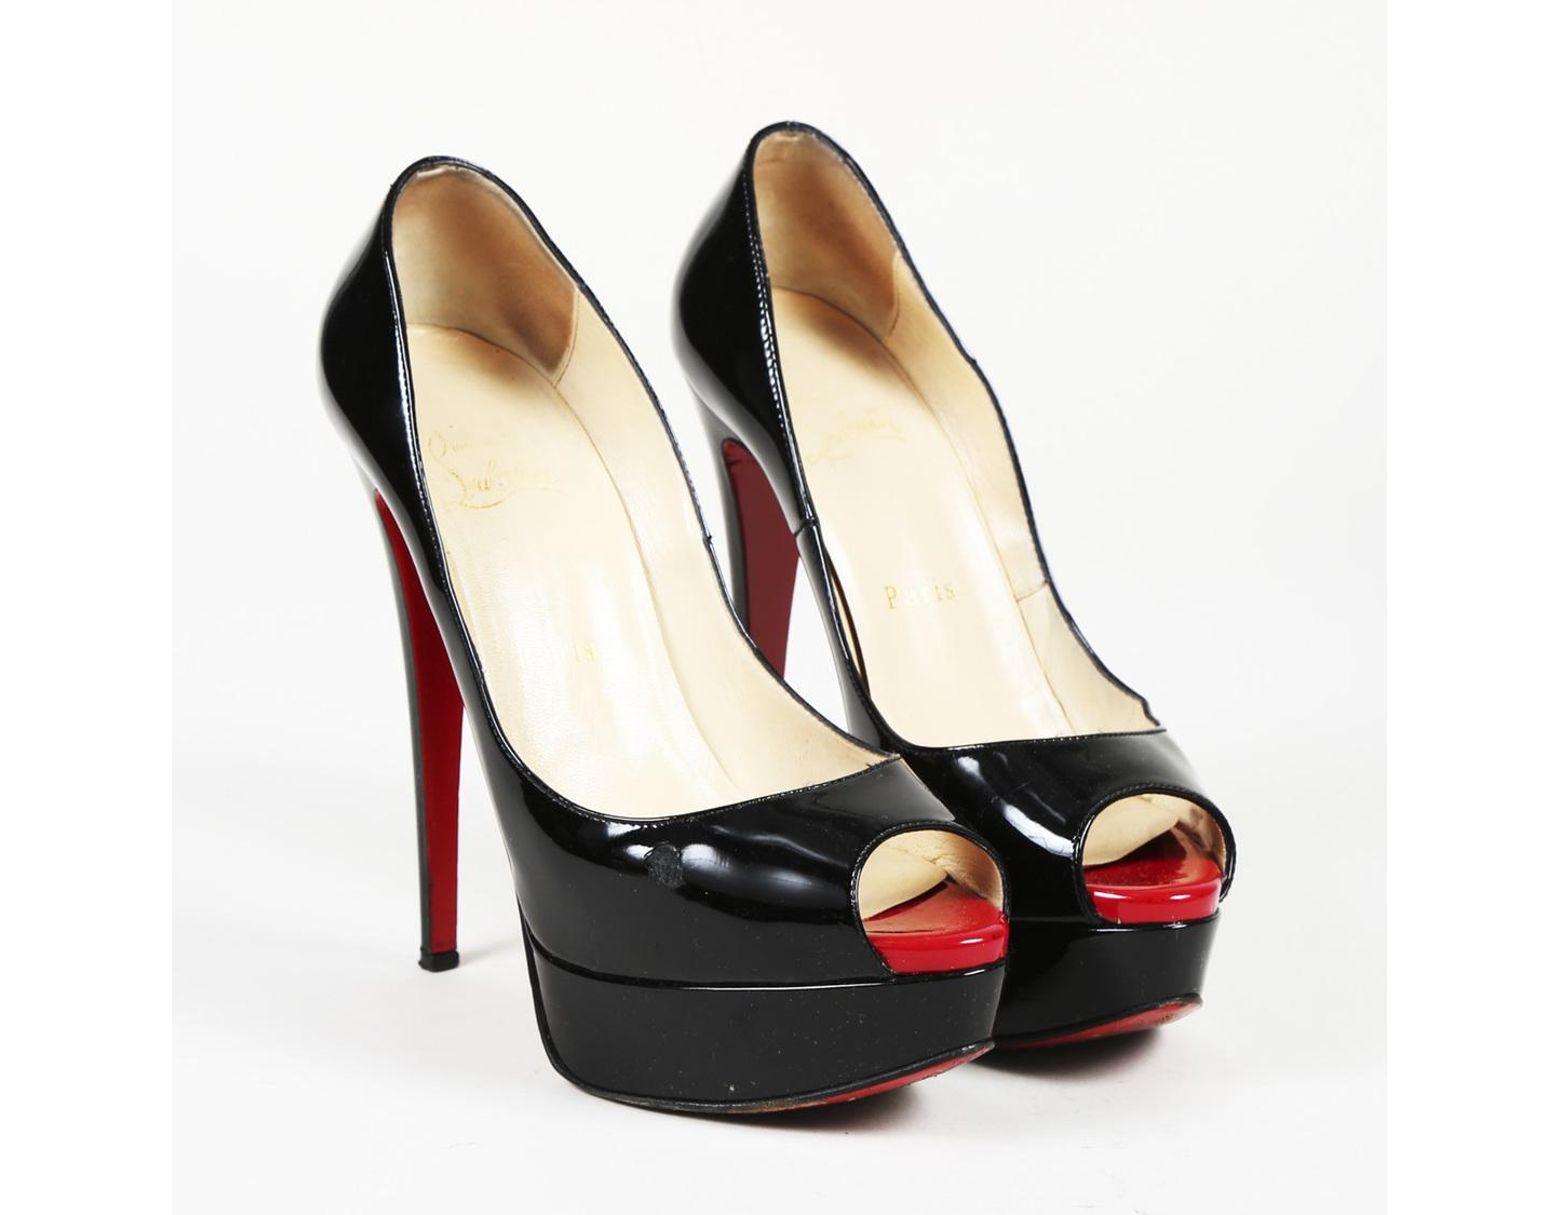 buy online c2812 aec62 Women's Black Patent Leather